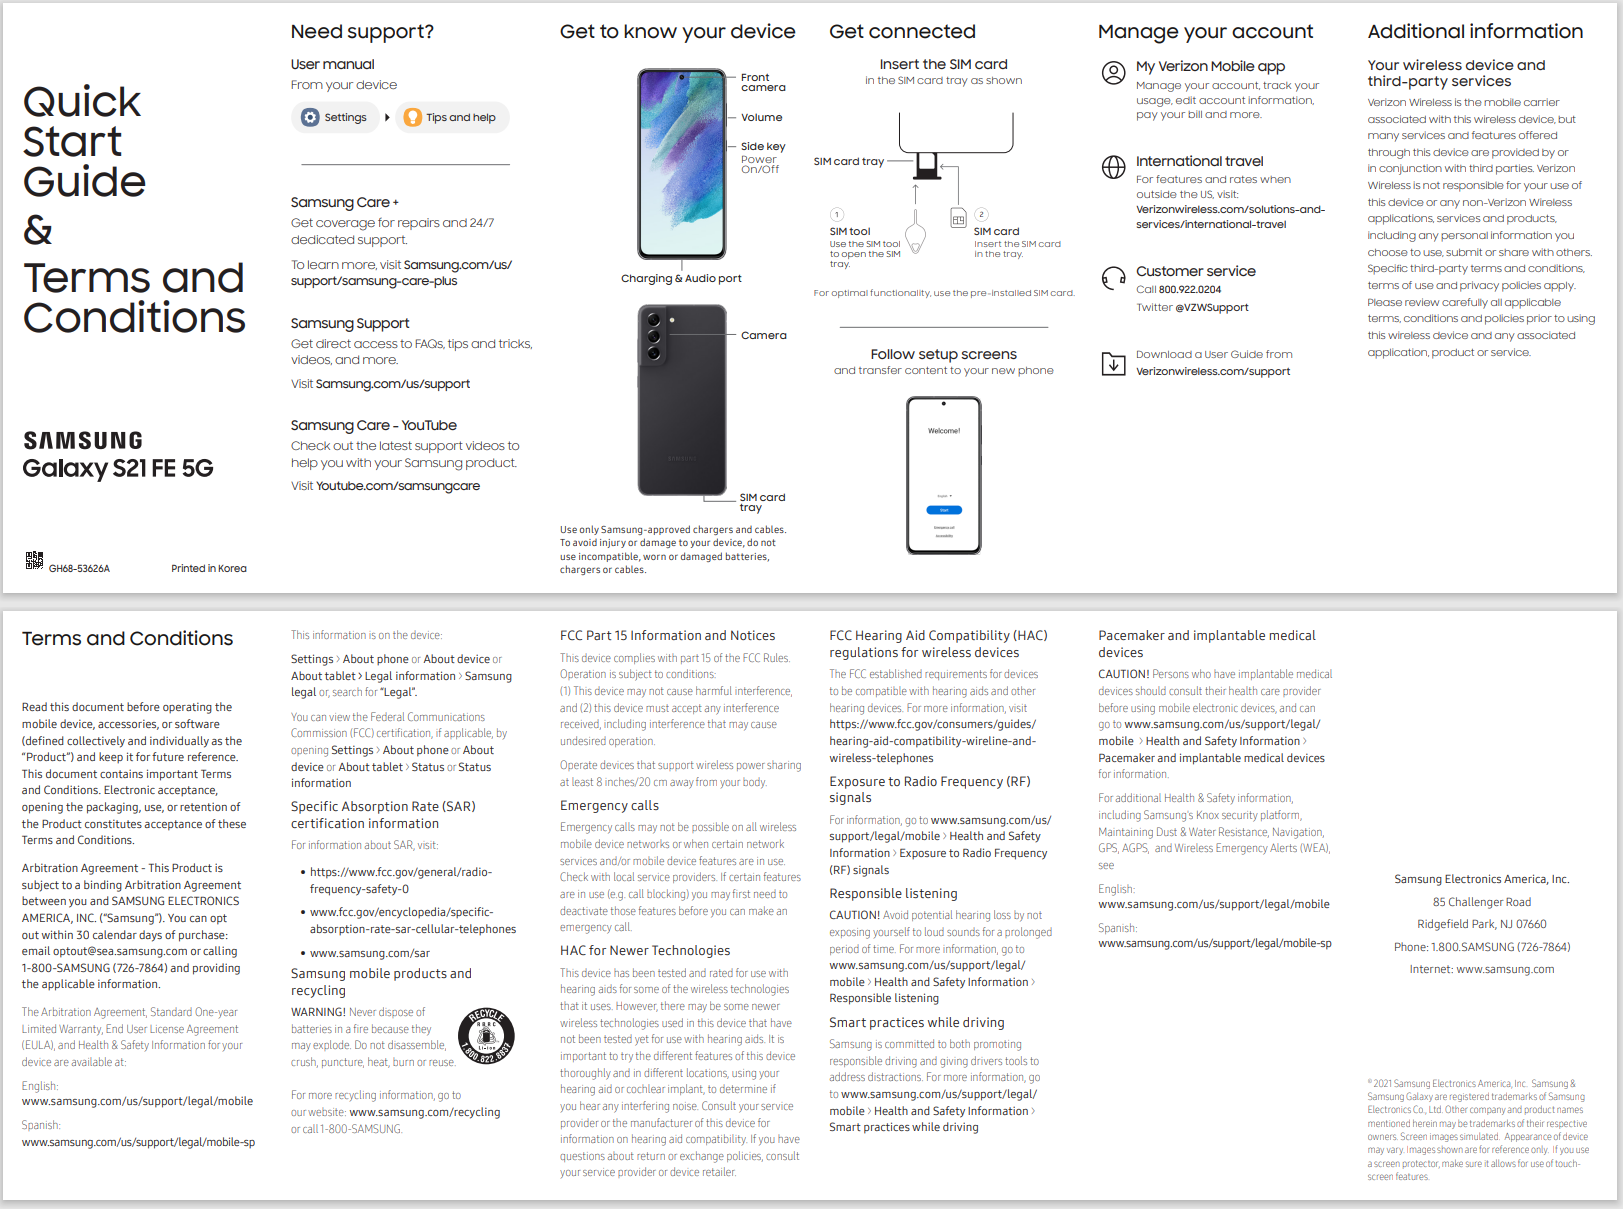 Galaxy S21 FE Verizon quick start guide